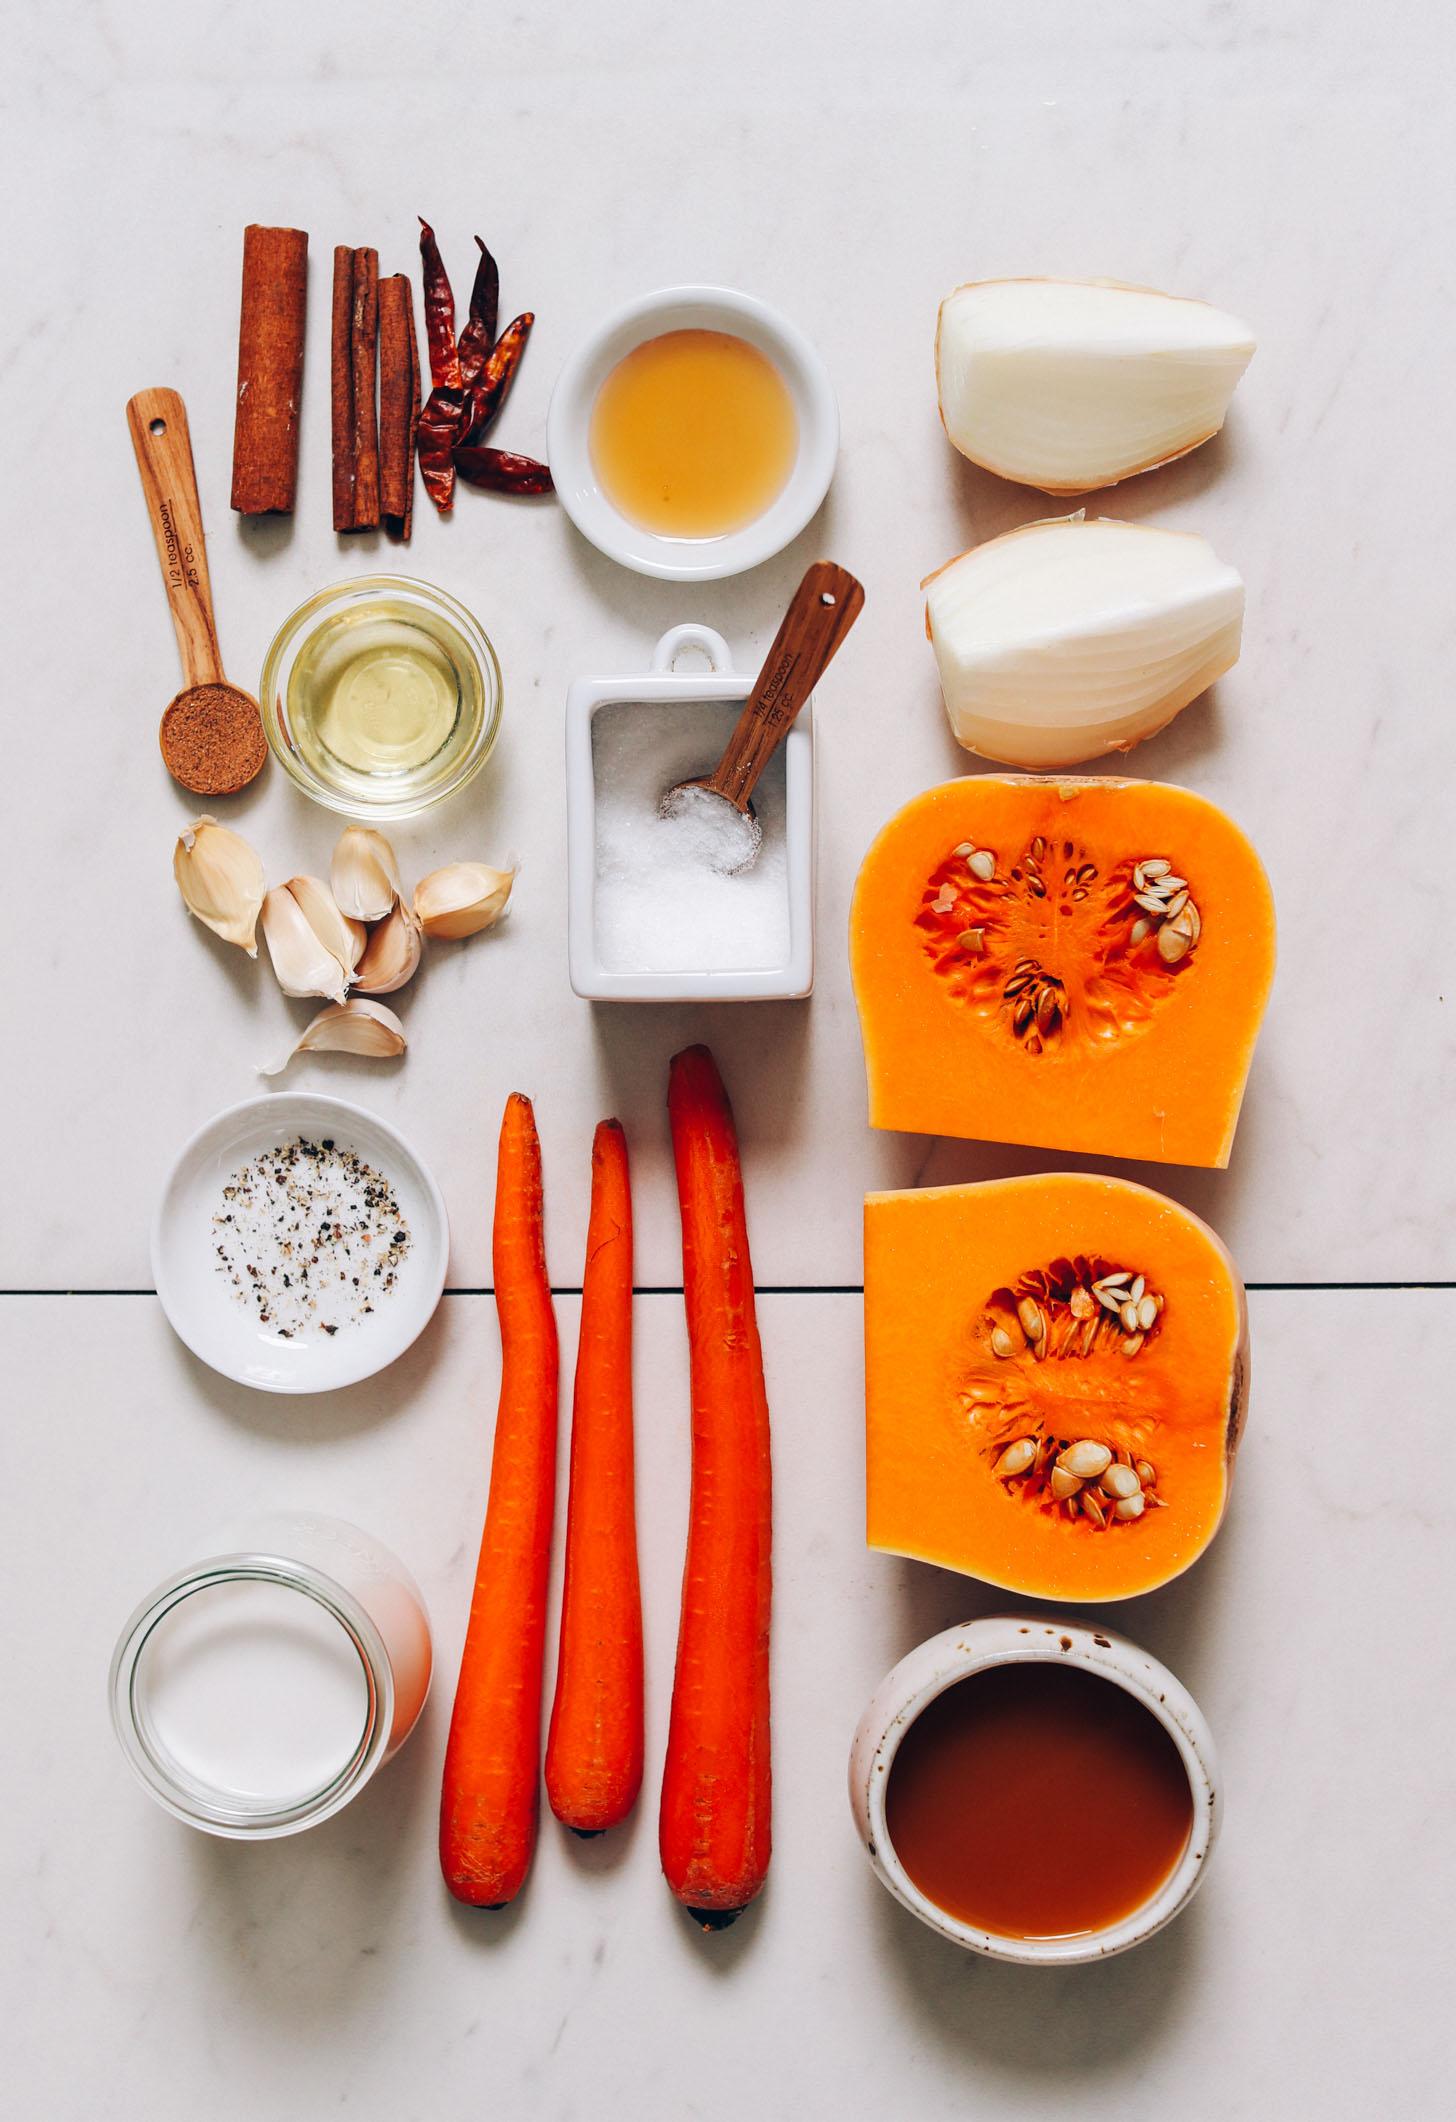 Cinnamon, cayenne, maple syrup, onion, butternut squash, vegetable broth, carrots, salt, pepper, coconut milk, garlic, avocado oil, and nutmeg